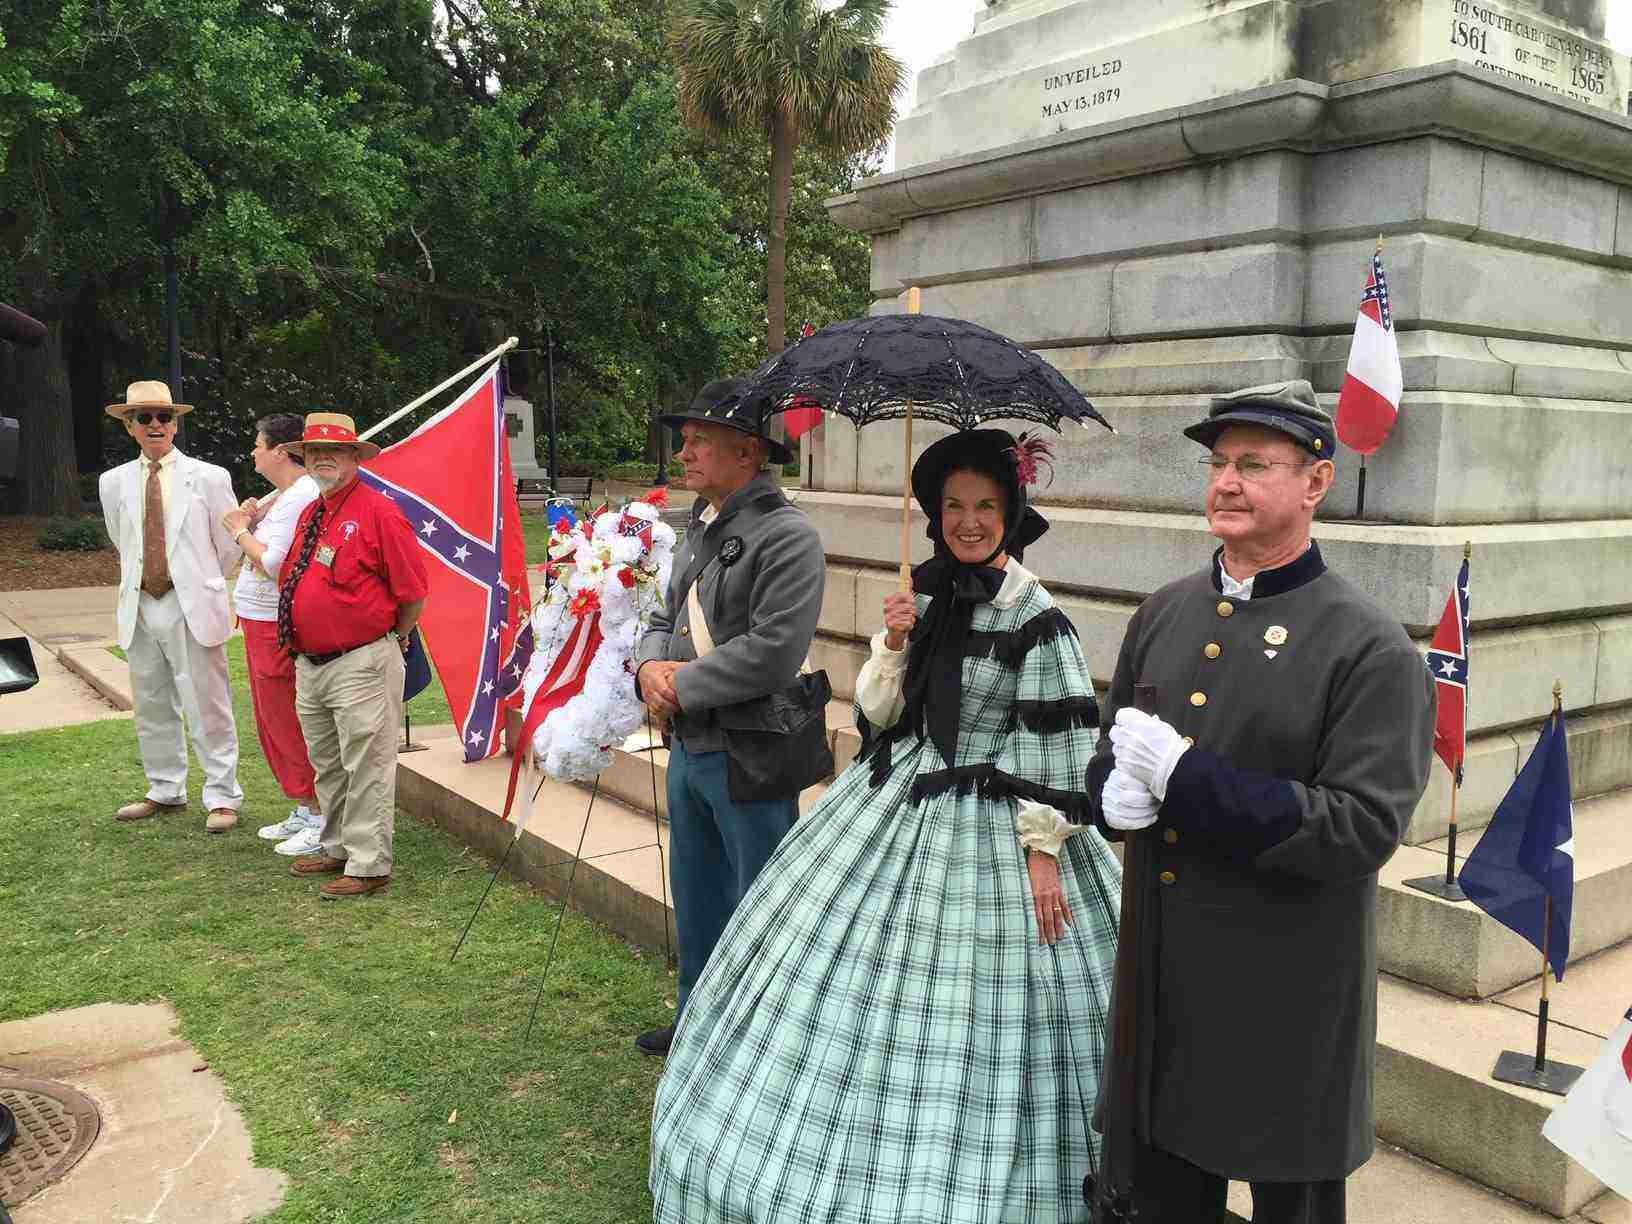 rsz_confederate_memorial_day(1)_183037